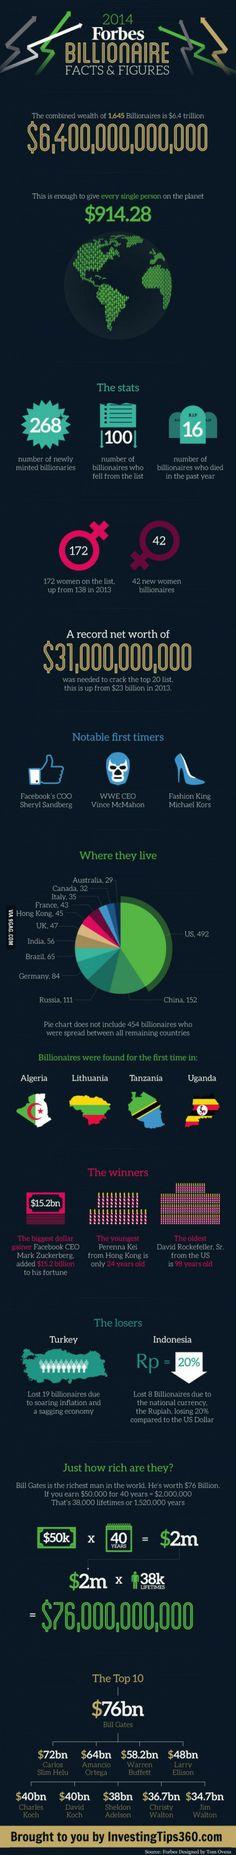 Forbes Billionaire Facts & Figures